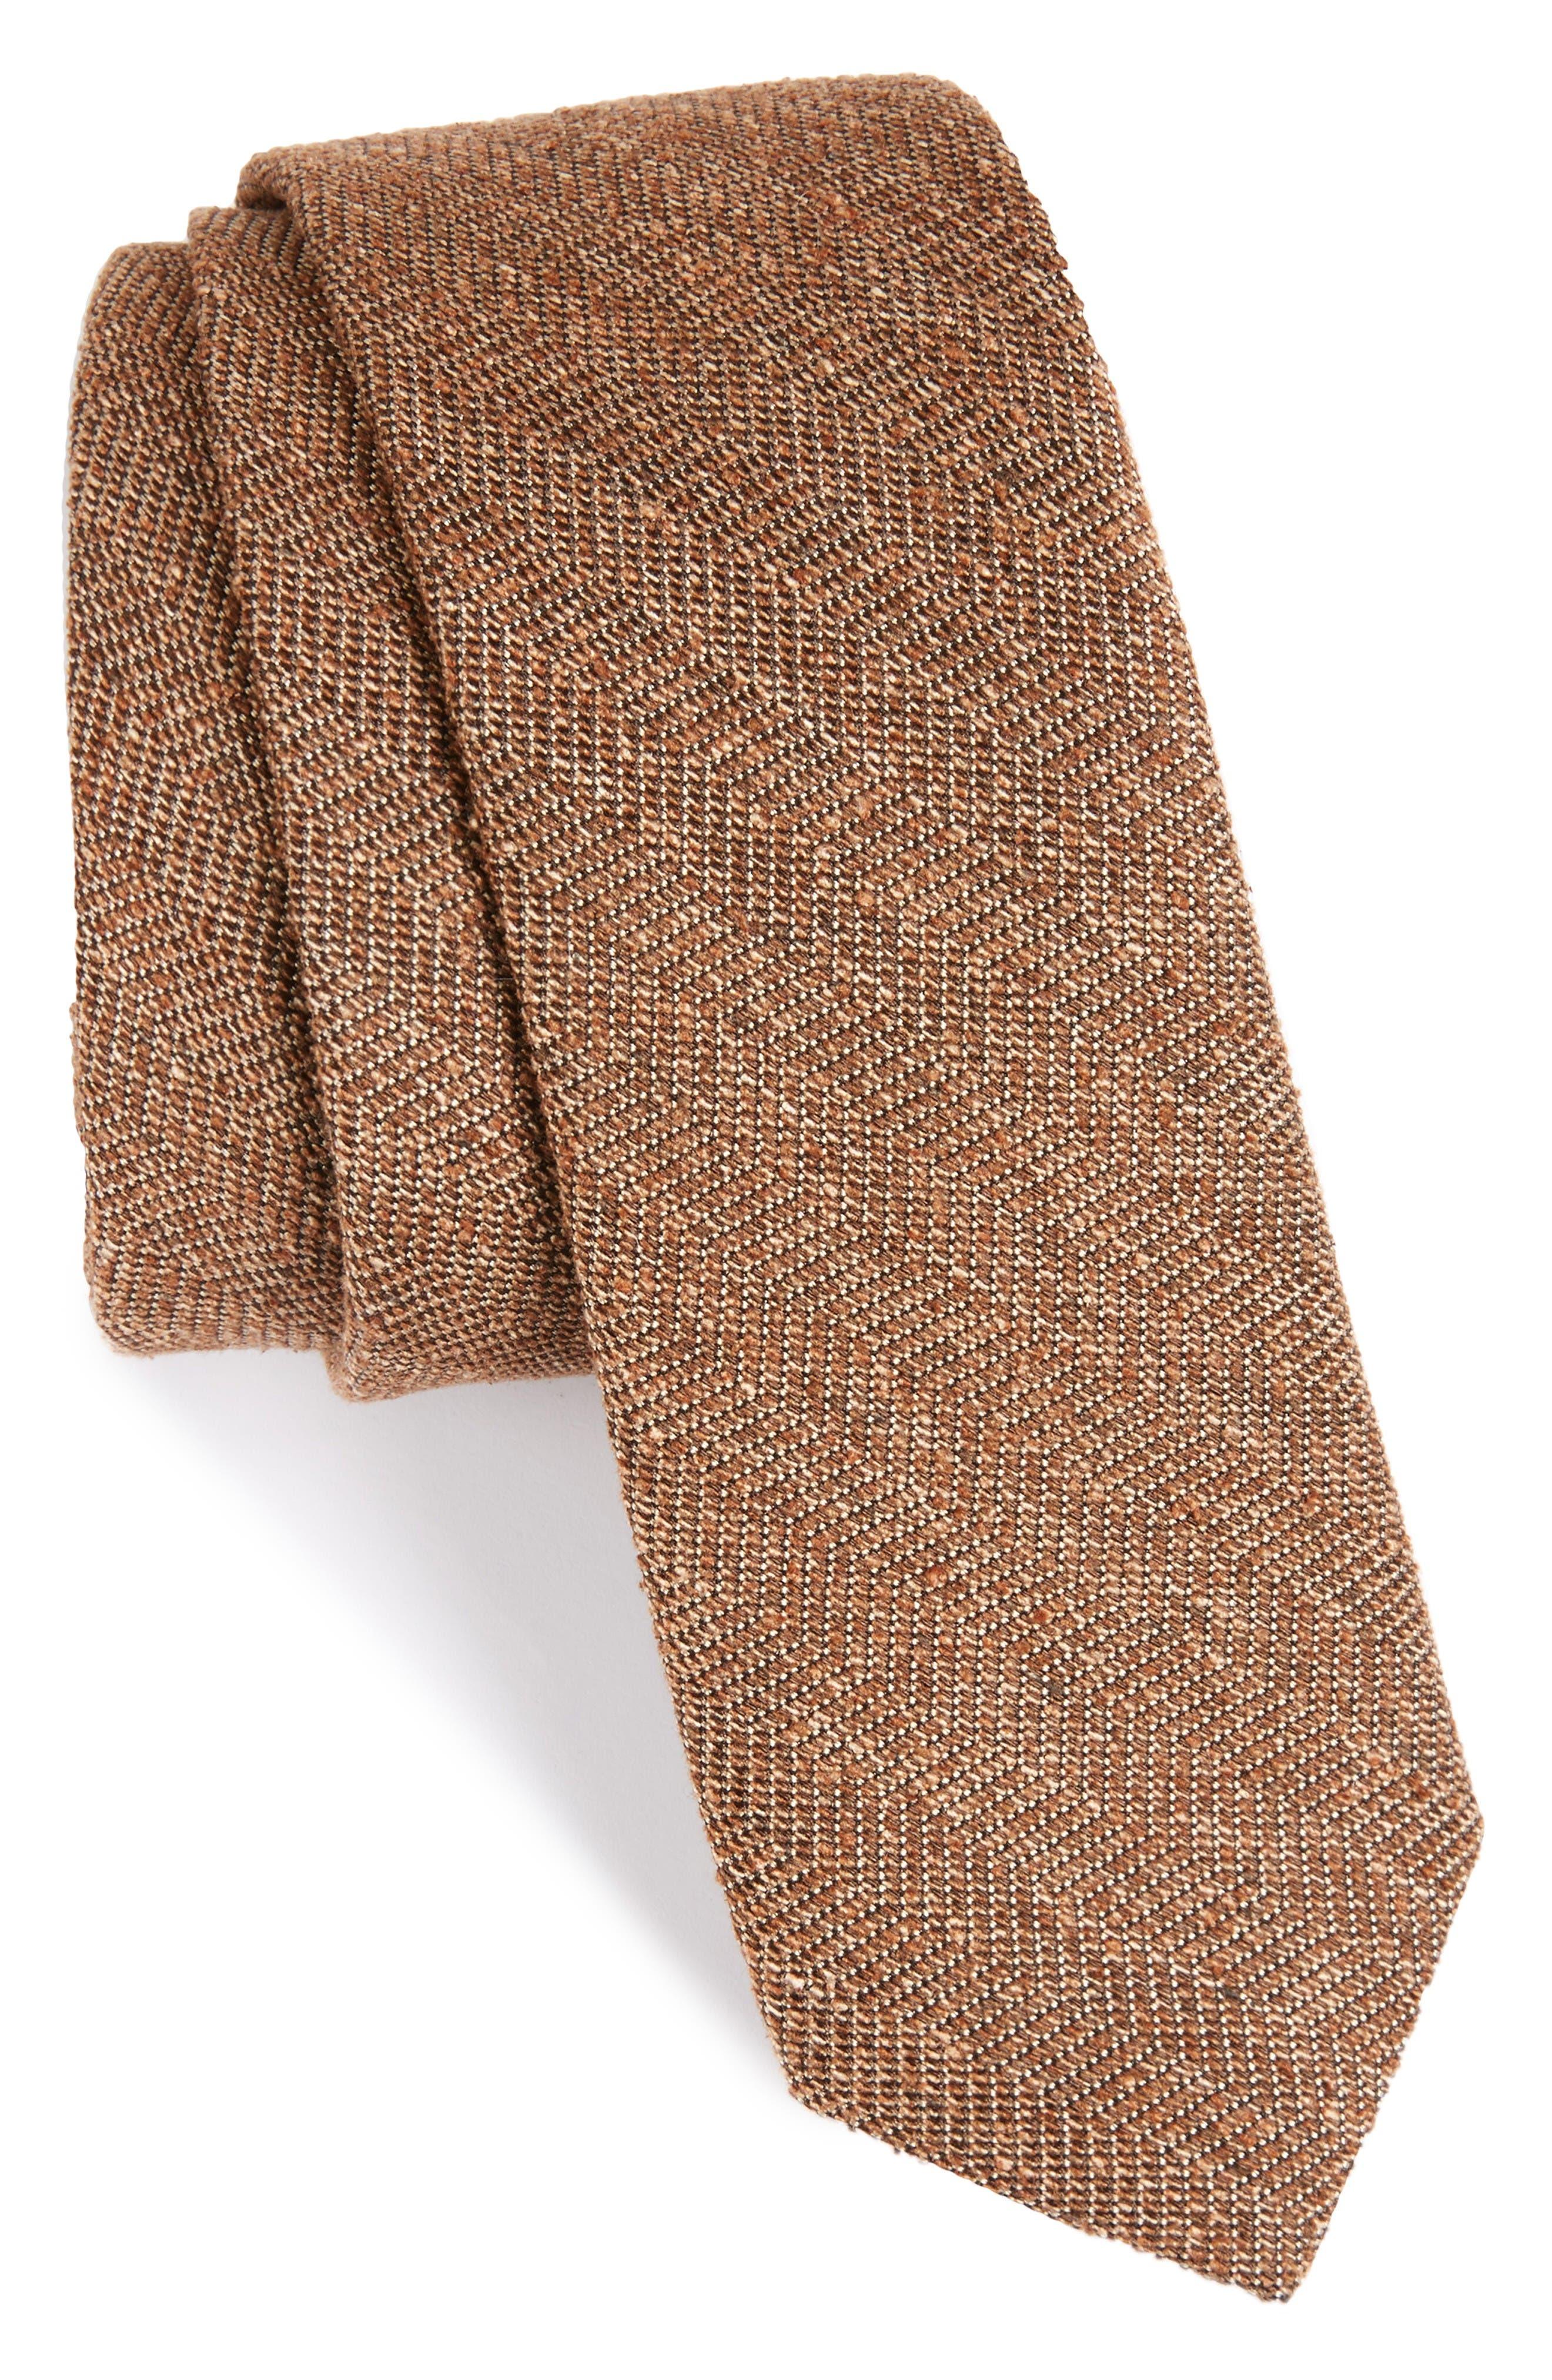 Zigzag Silk Tie,                             Main thumbnail 1, color,                             Brown